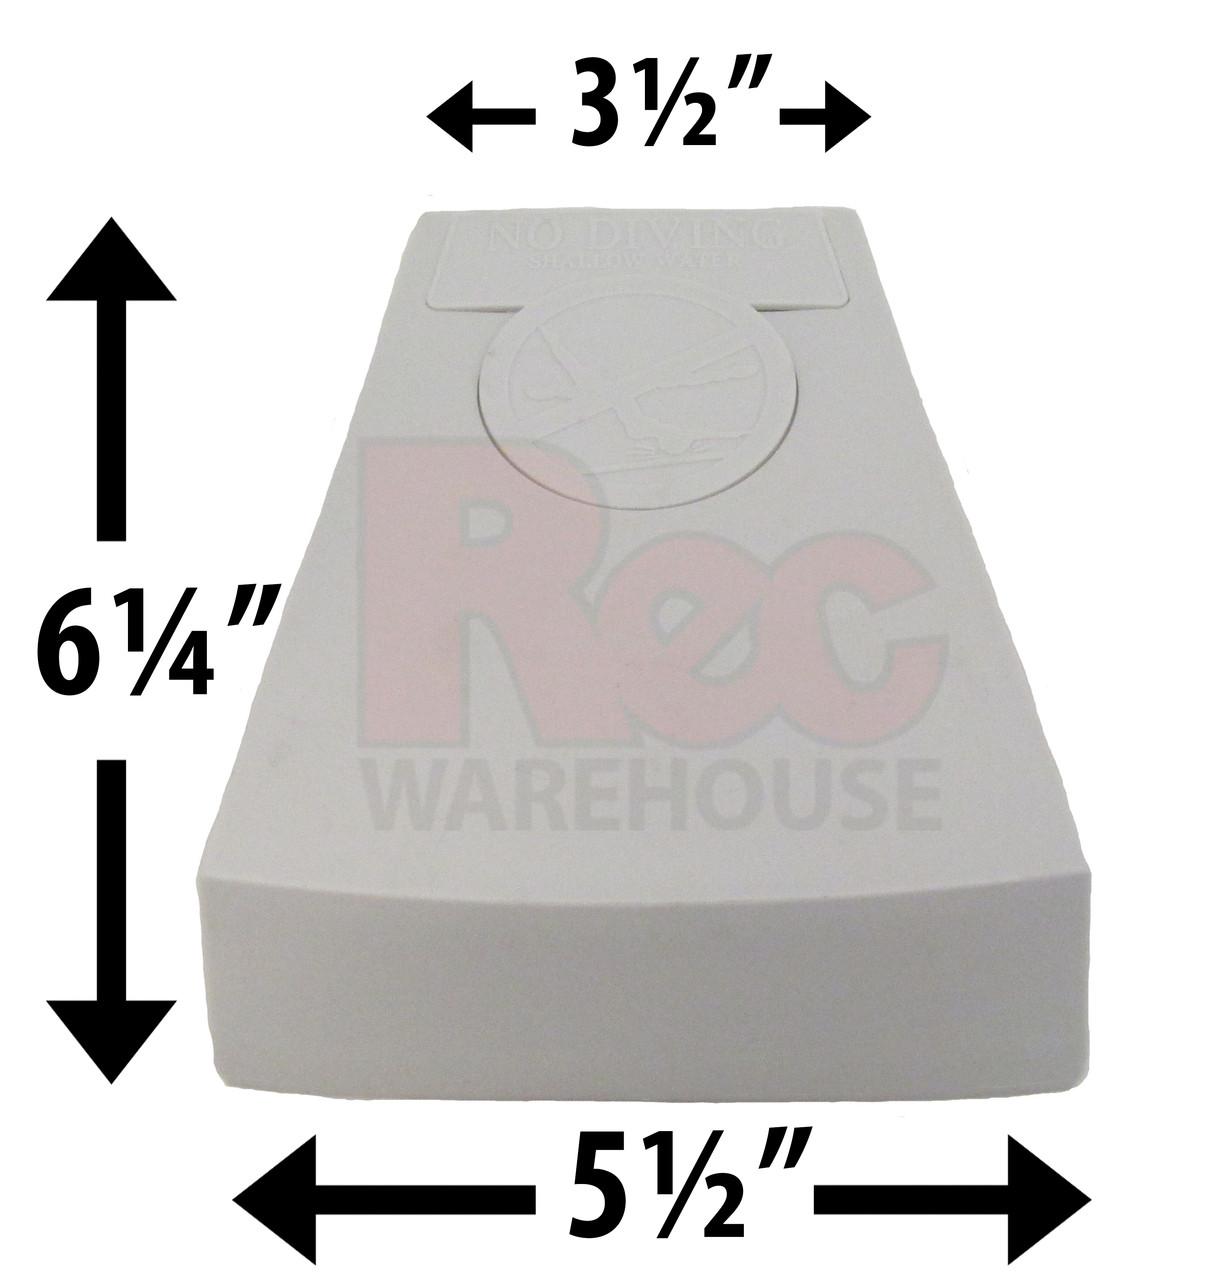 Wilbar PONDEROSA Top Cap Pewter Gray - 27035 - Buy 3 or More and Save 10%